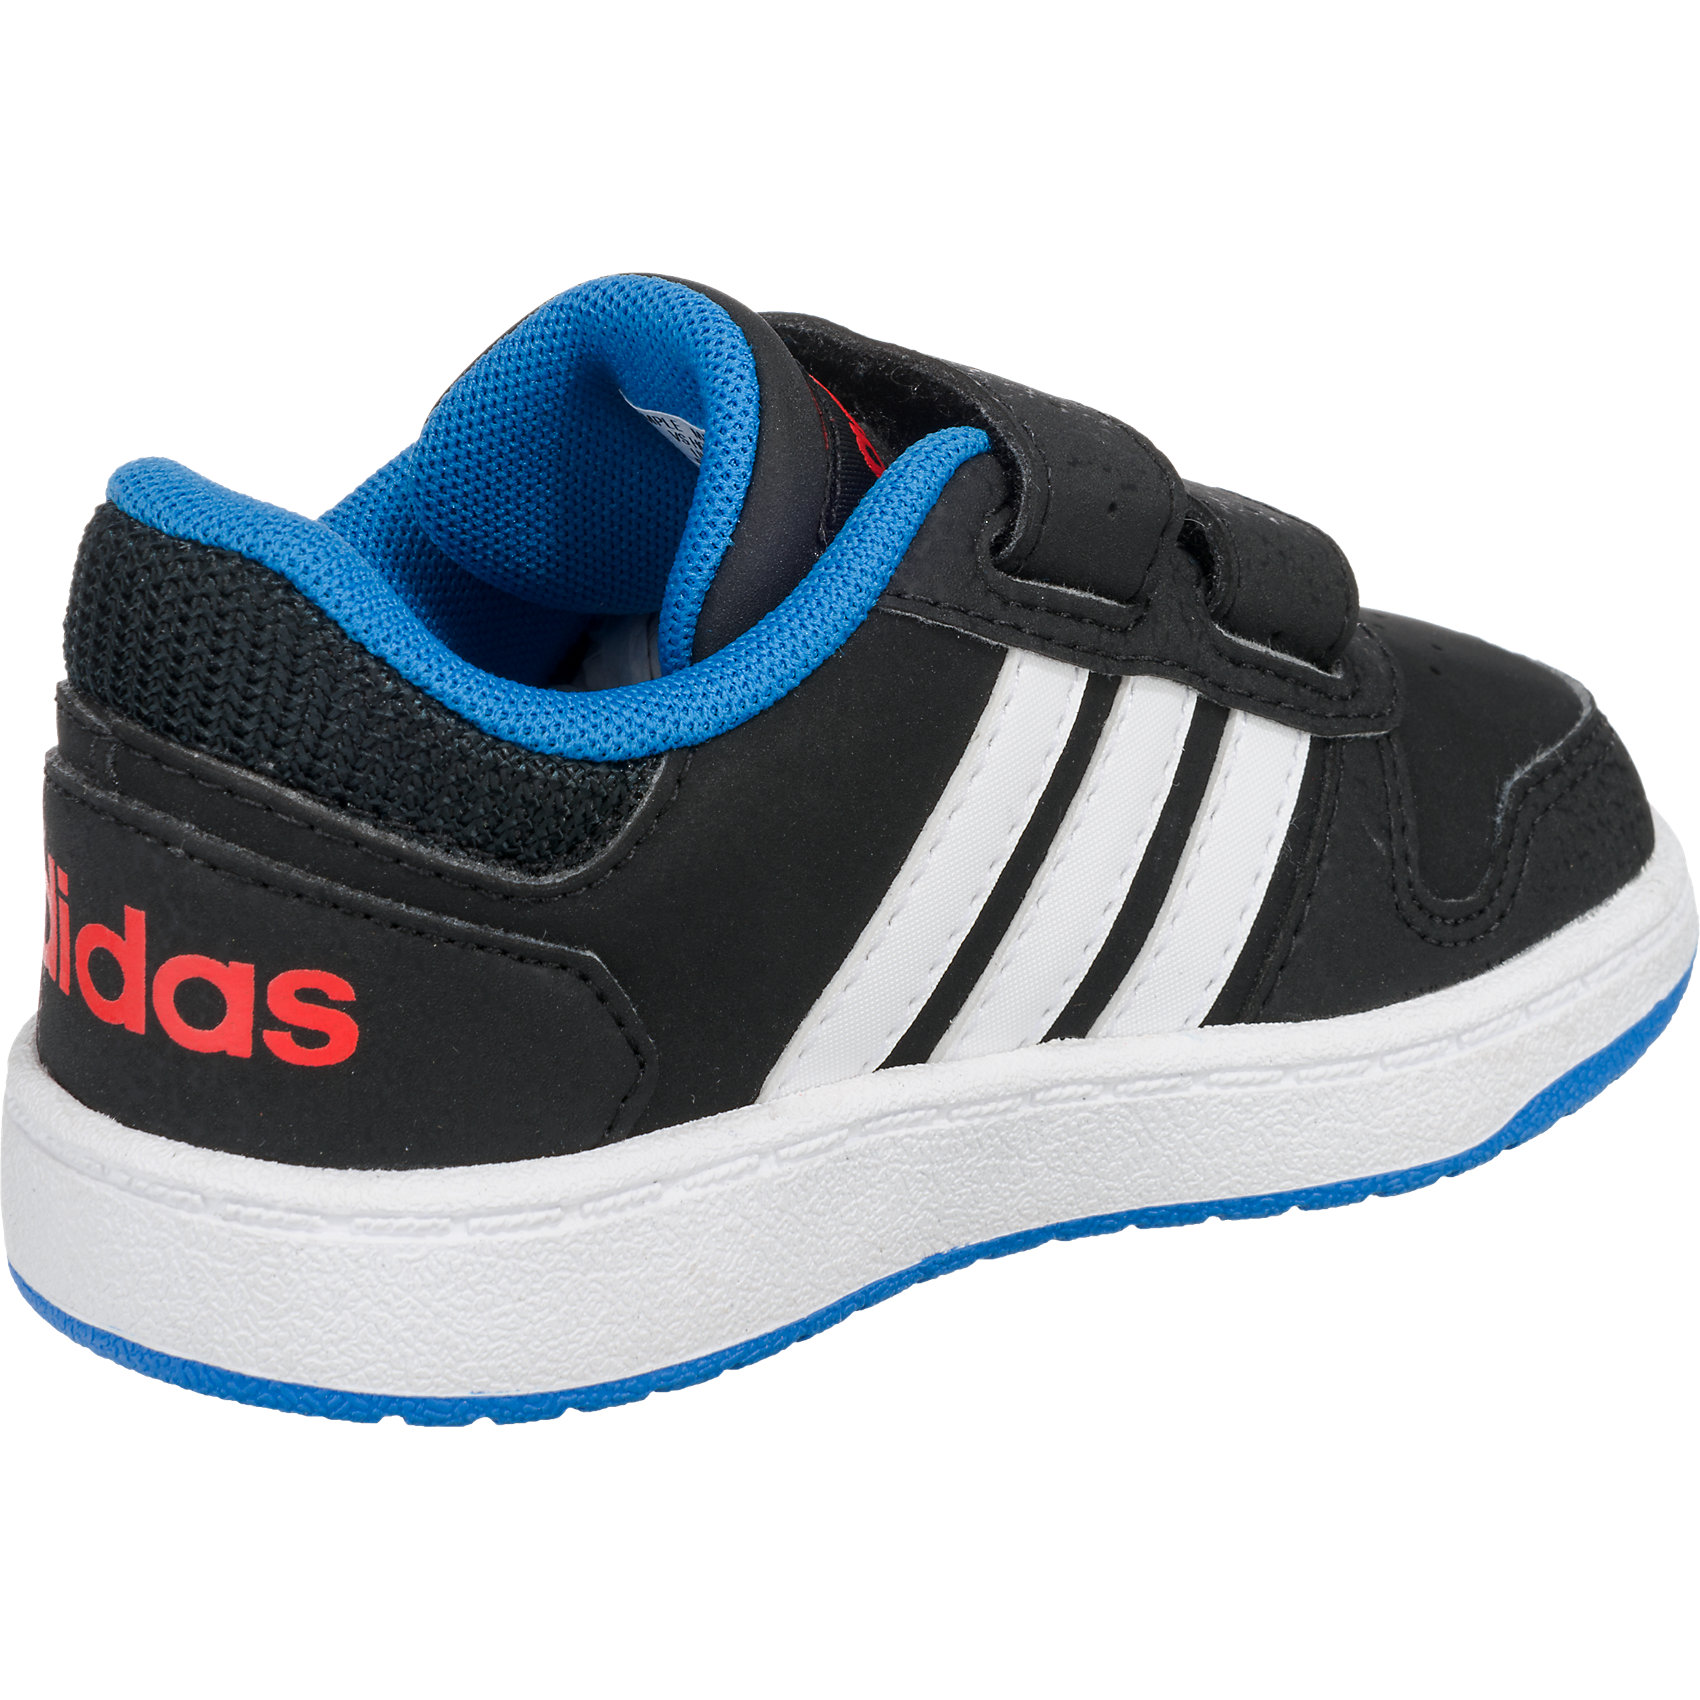 Neu adidas Sport Inspired Baby Sneakers HOOPS 2.0 CMF I für Jungen 7213773